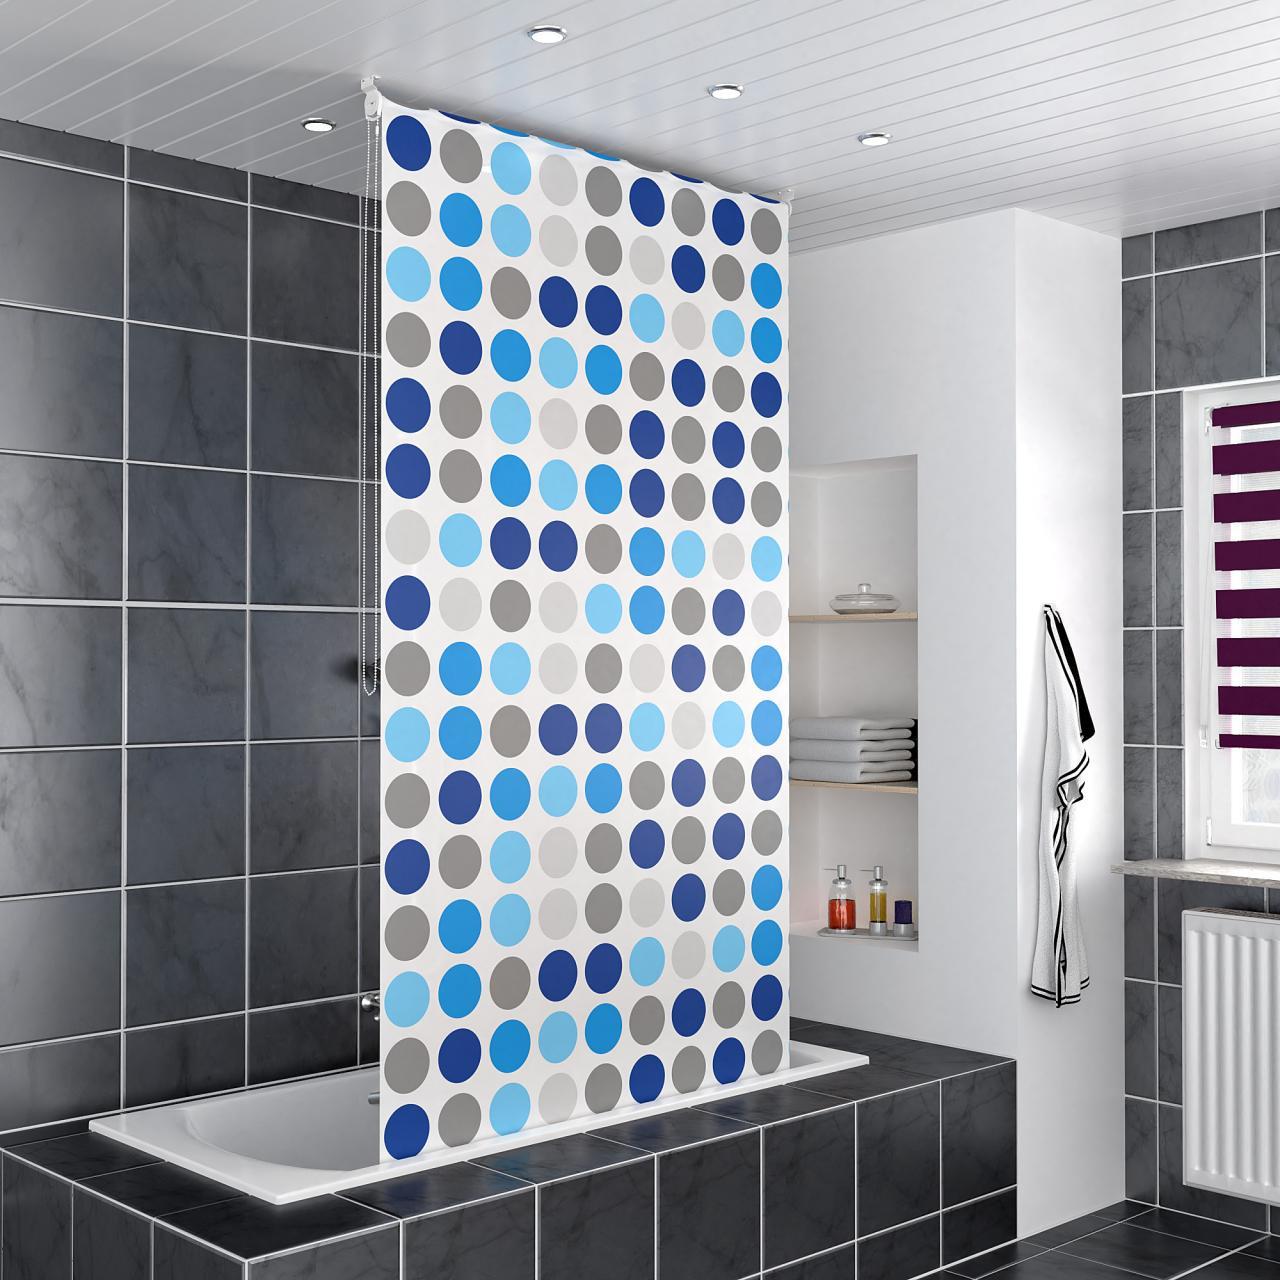 homelux duschrollo vorhang dusche bad alu klemmstange. Black Bedroom Furniture Sets. Home Design Ideas